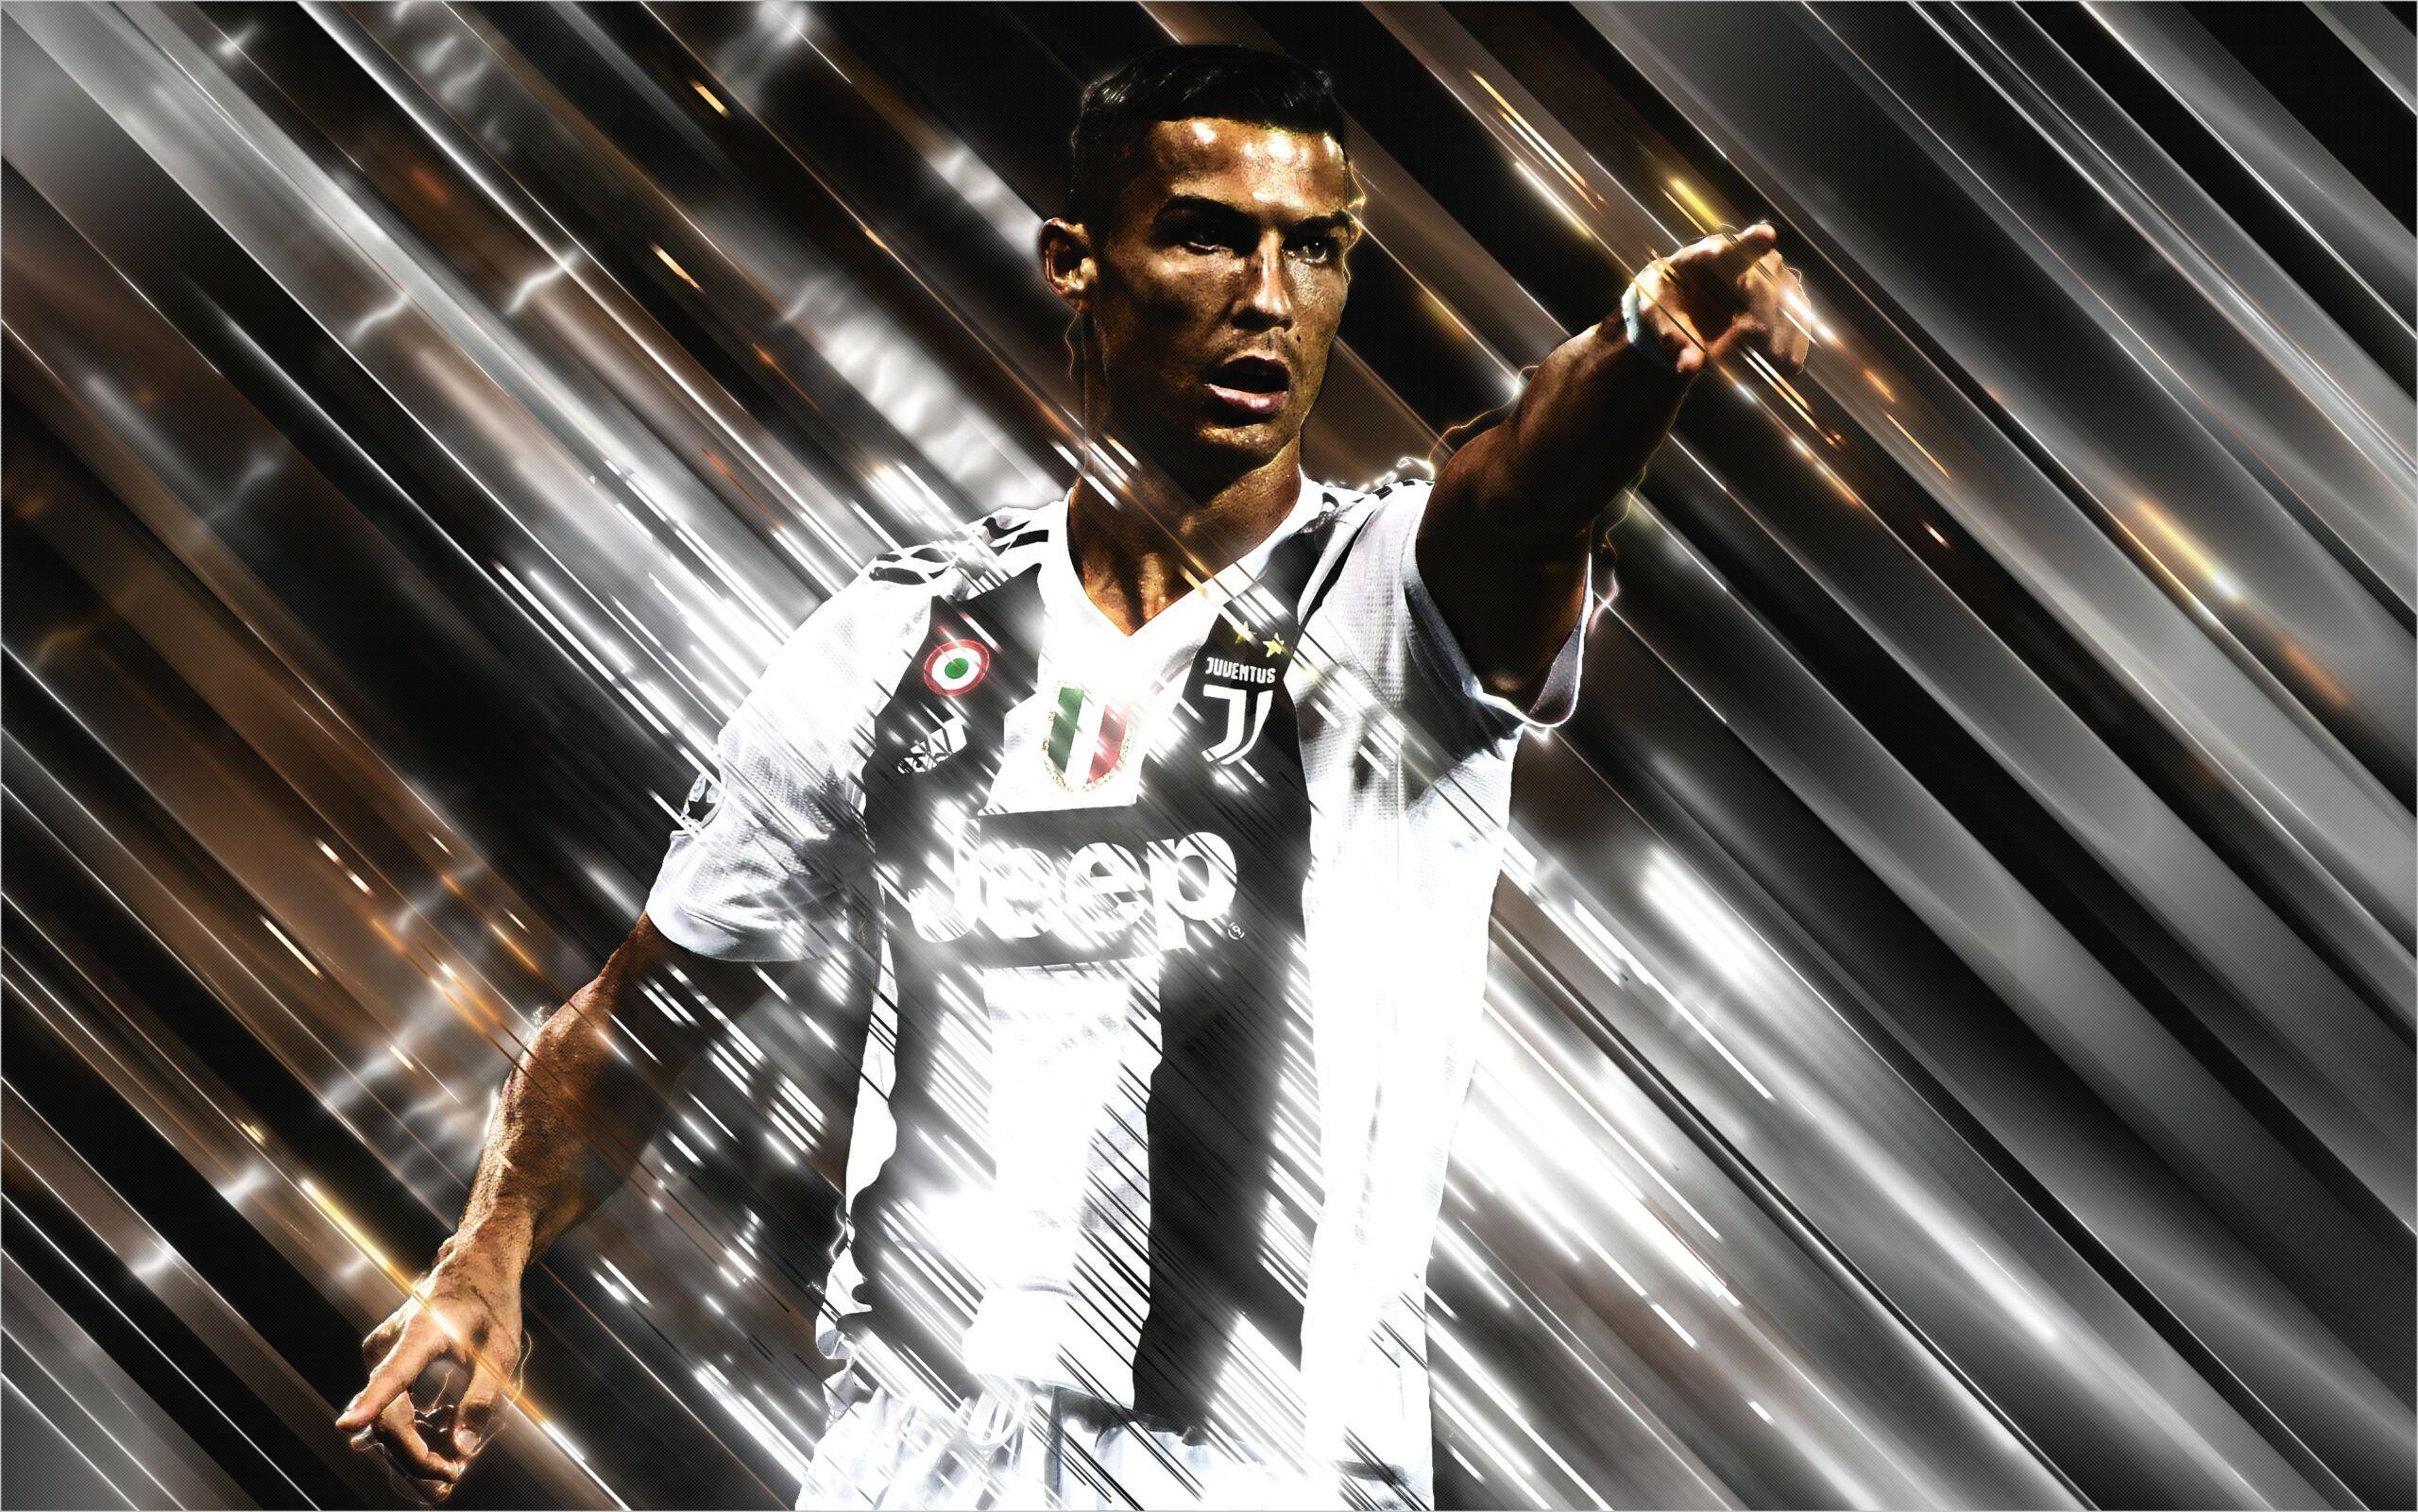 Cristiano Ronaldo Juventus Wallpaper 4k Cristiano Ronaldo Juventus Ronaldo Juventus Cristiano Ronaldo